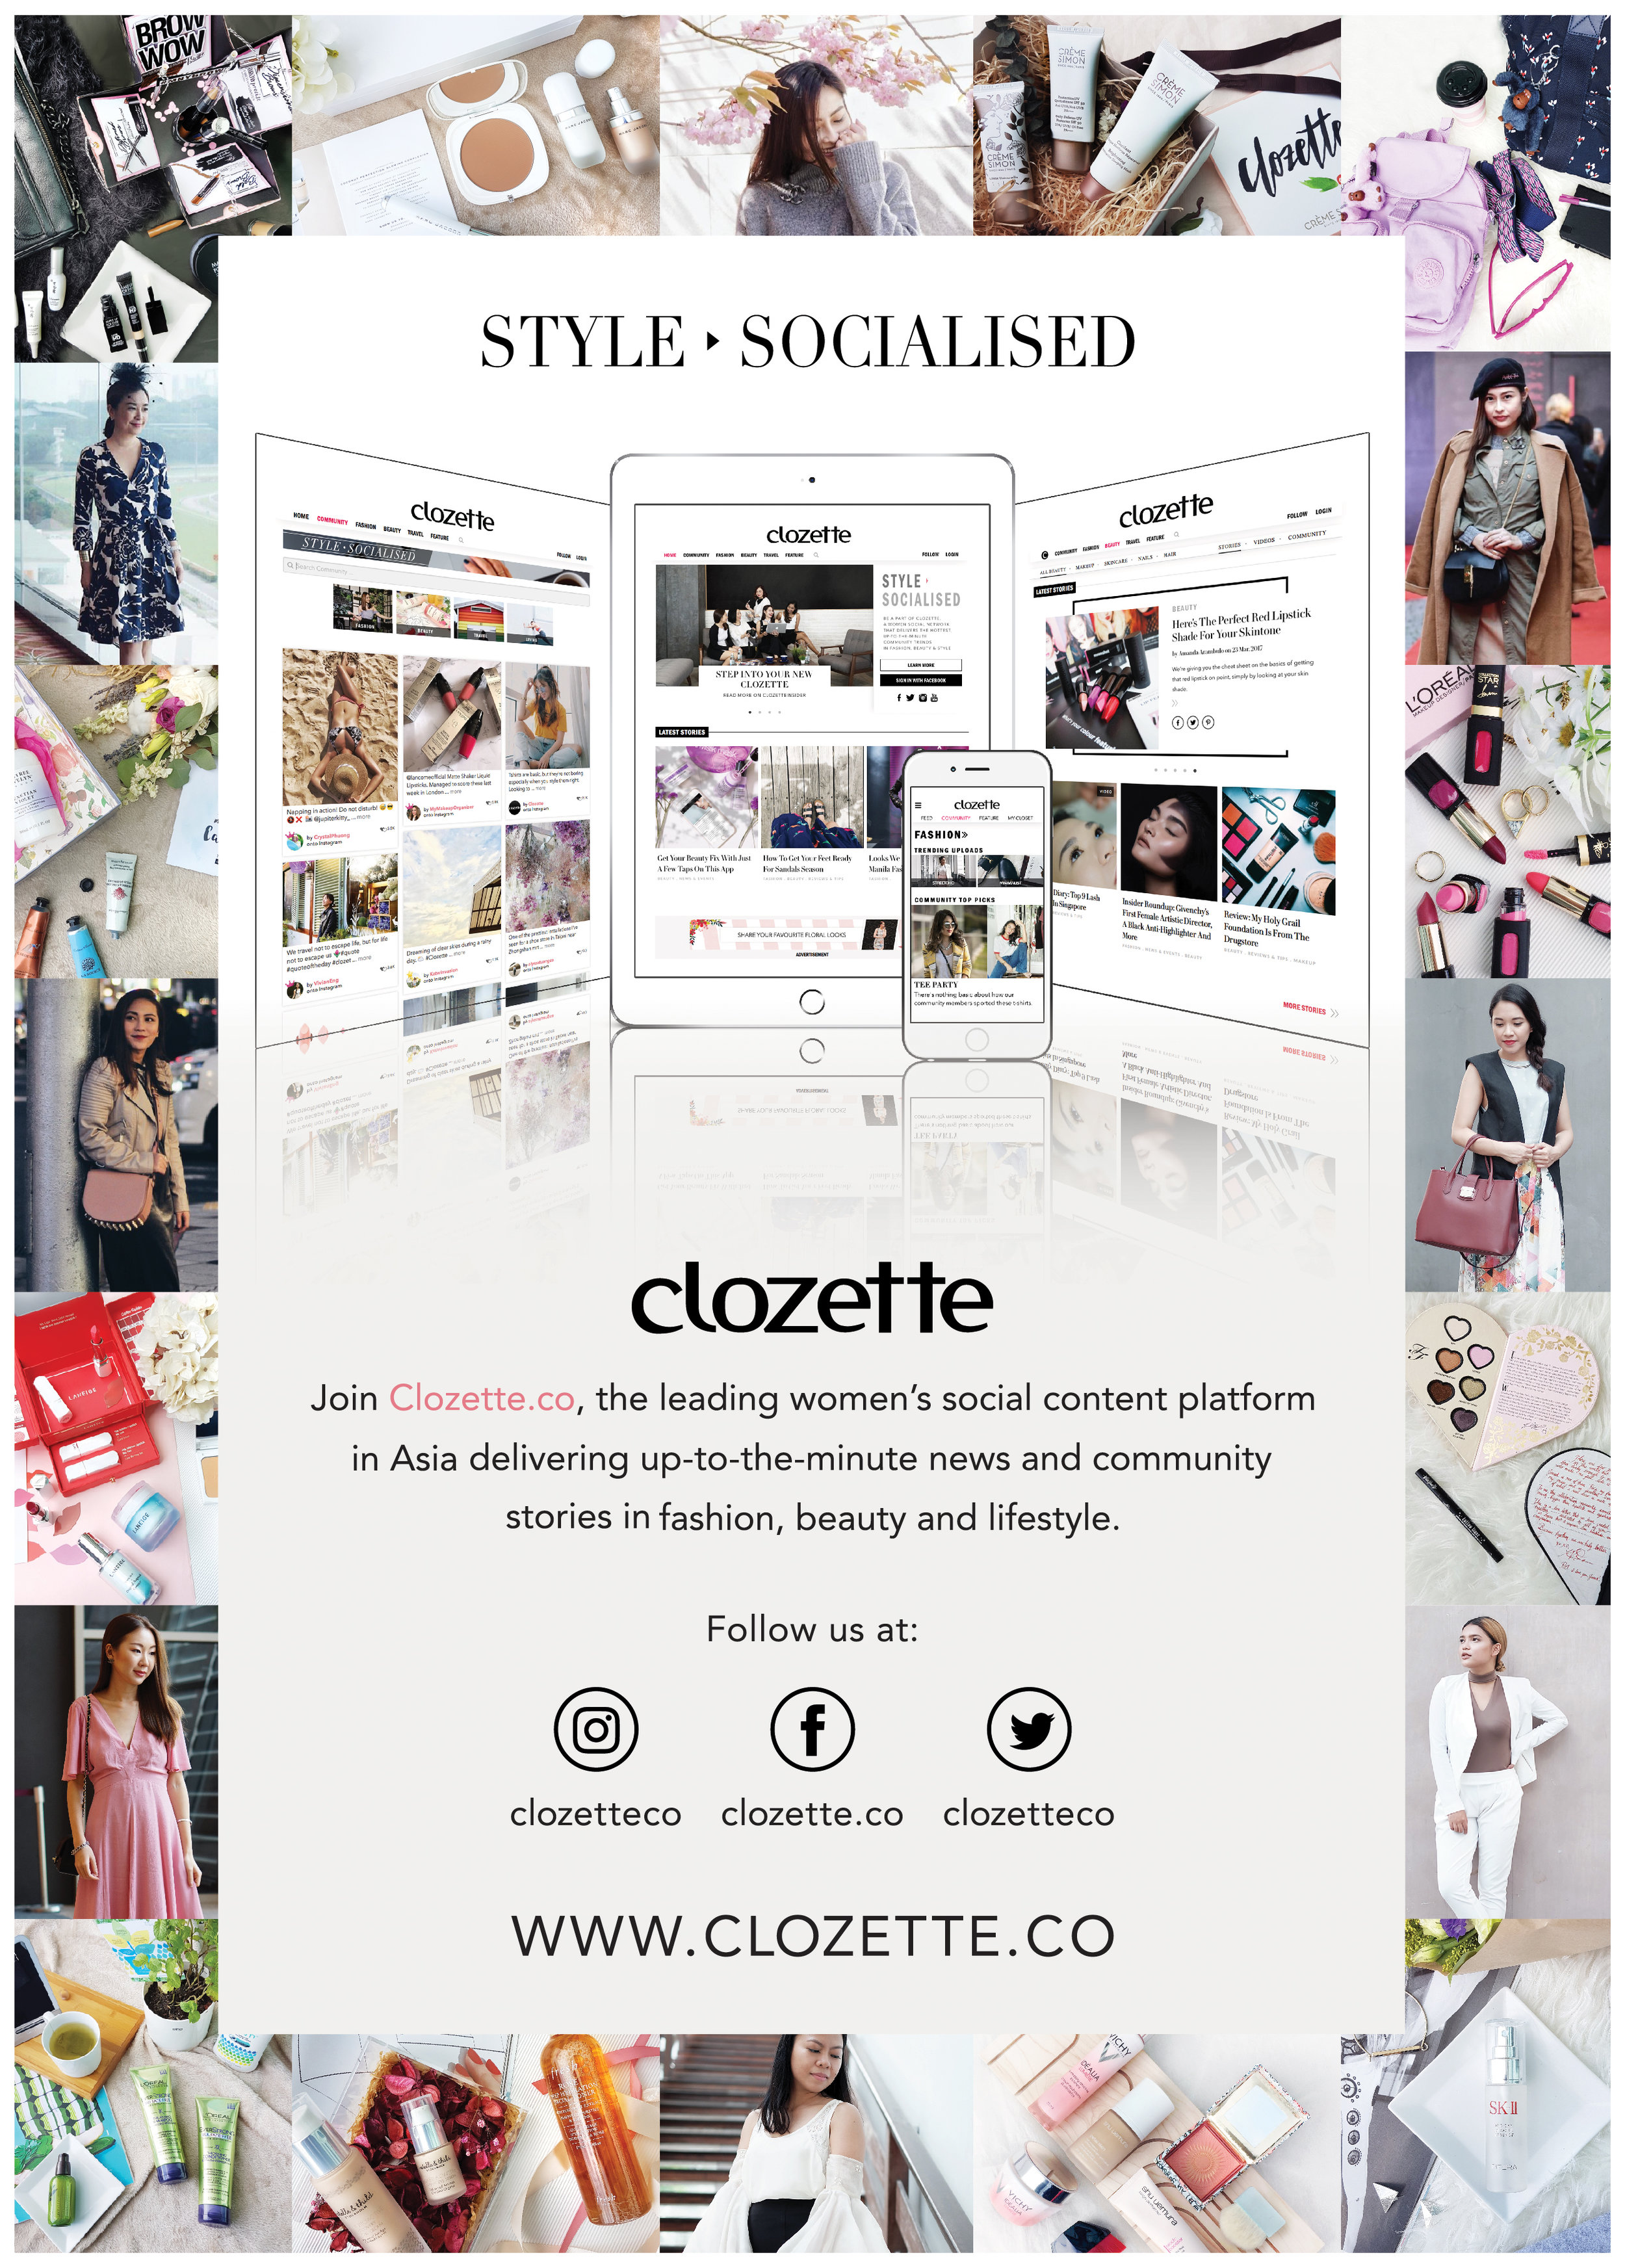 ClozetteAd-klfw2017 edited-01.jpg